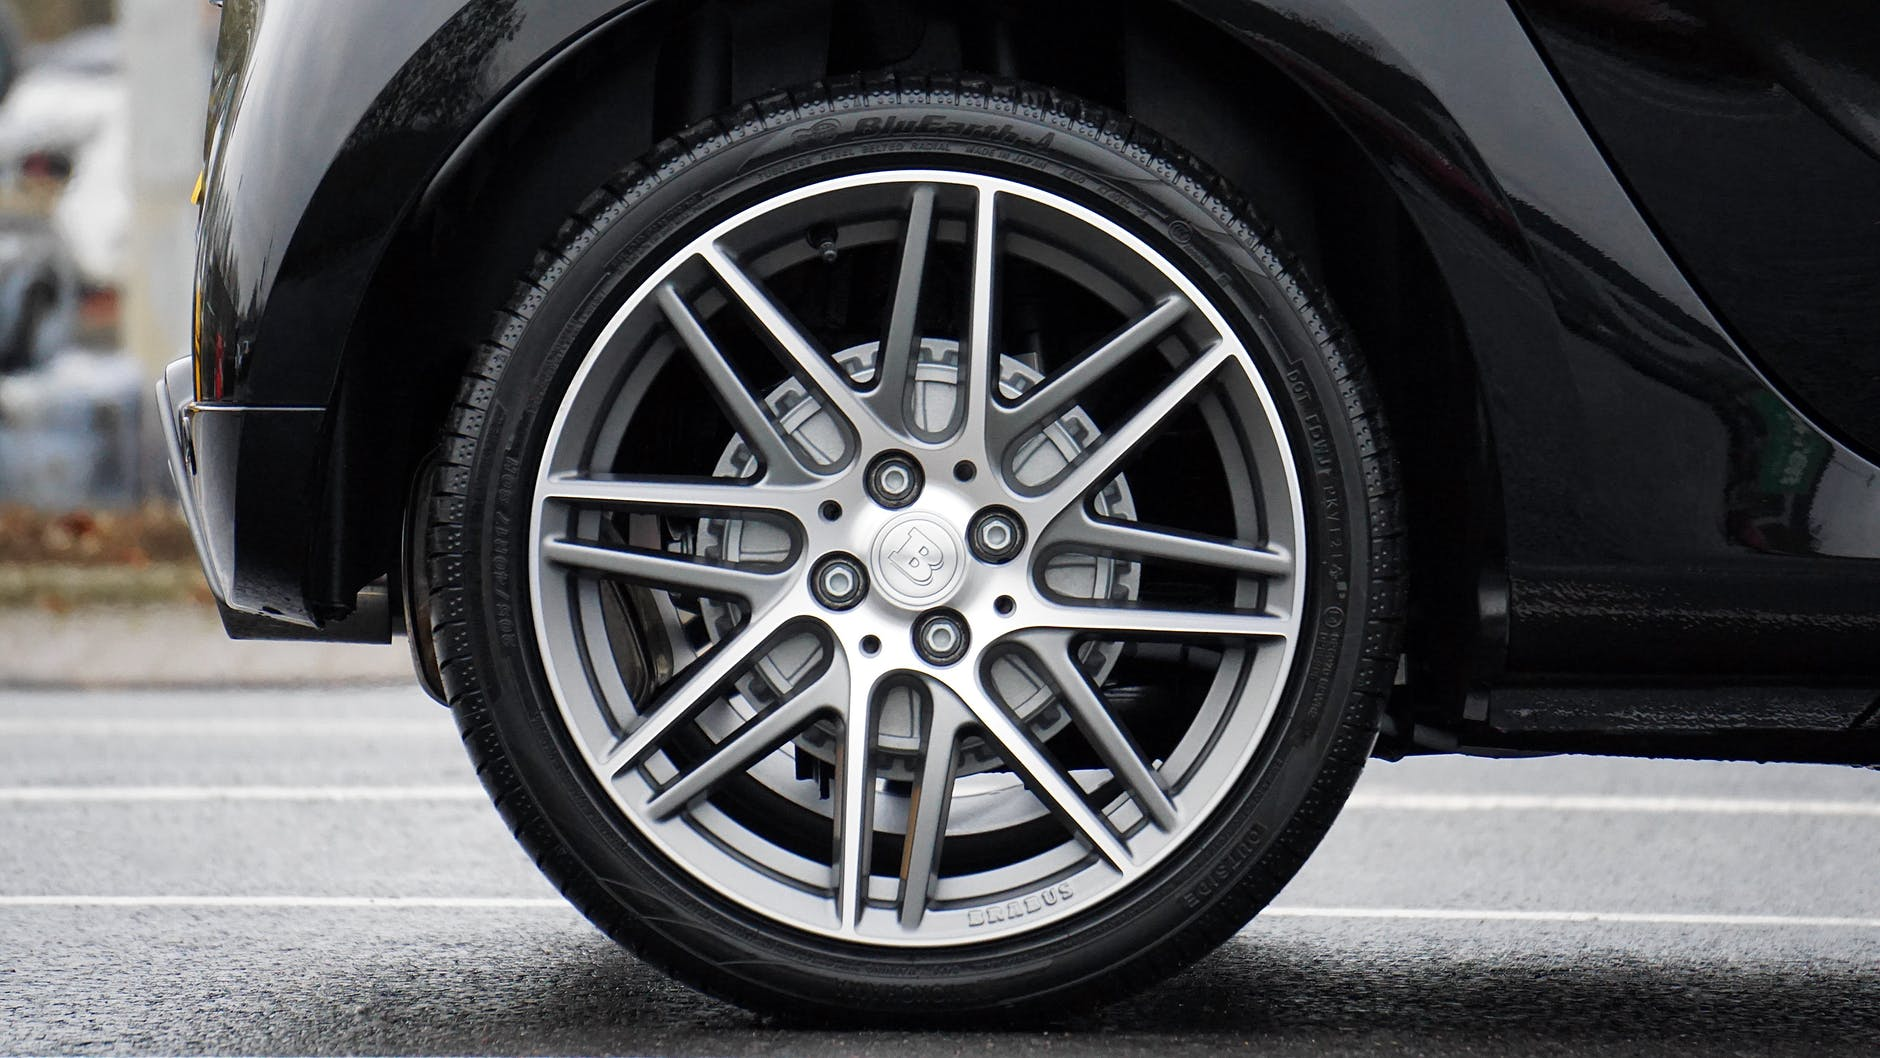 close up photograph of chrome vehicle wheel